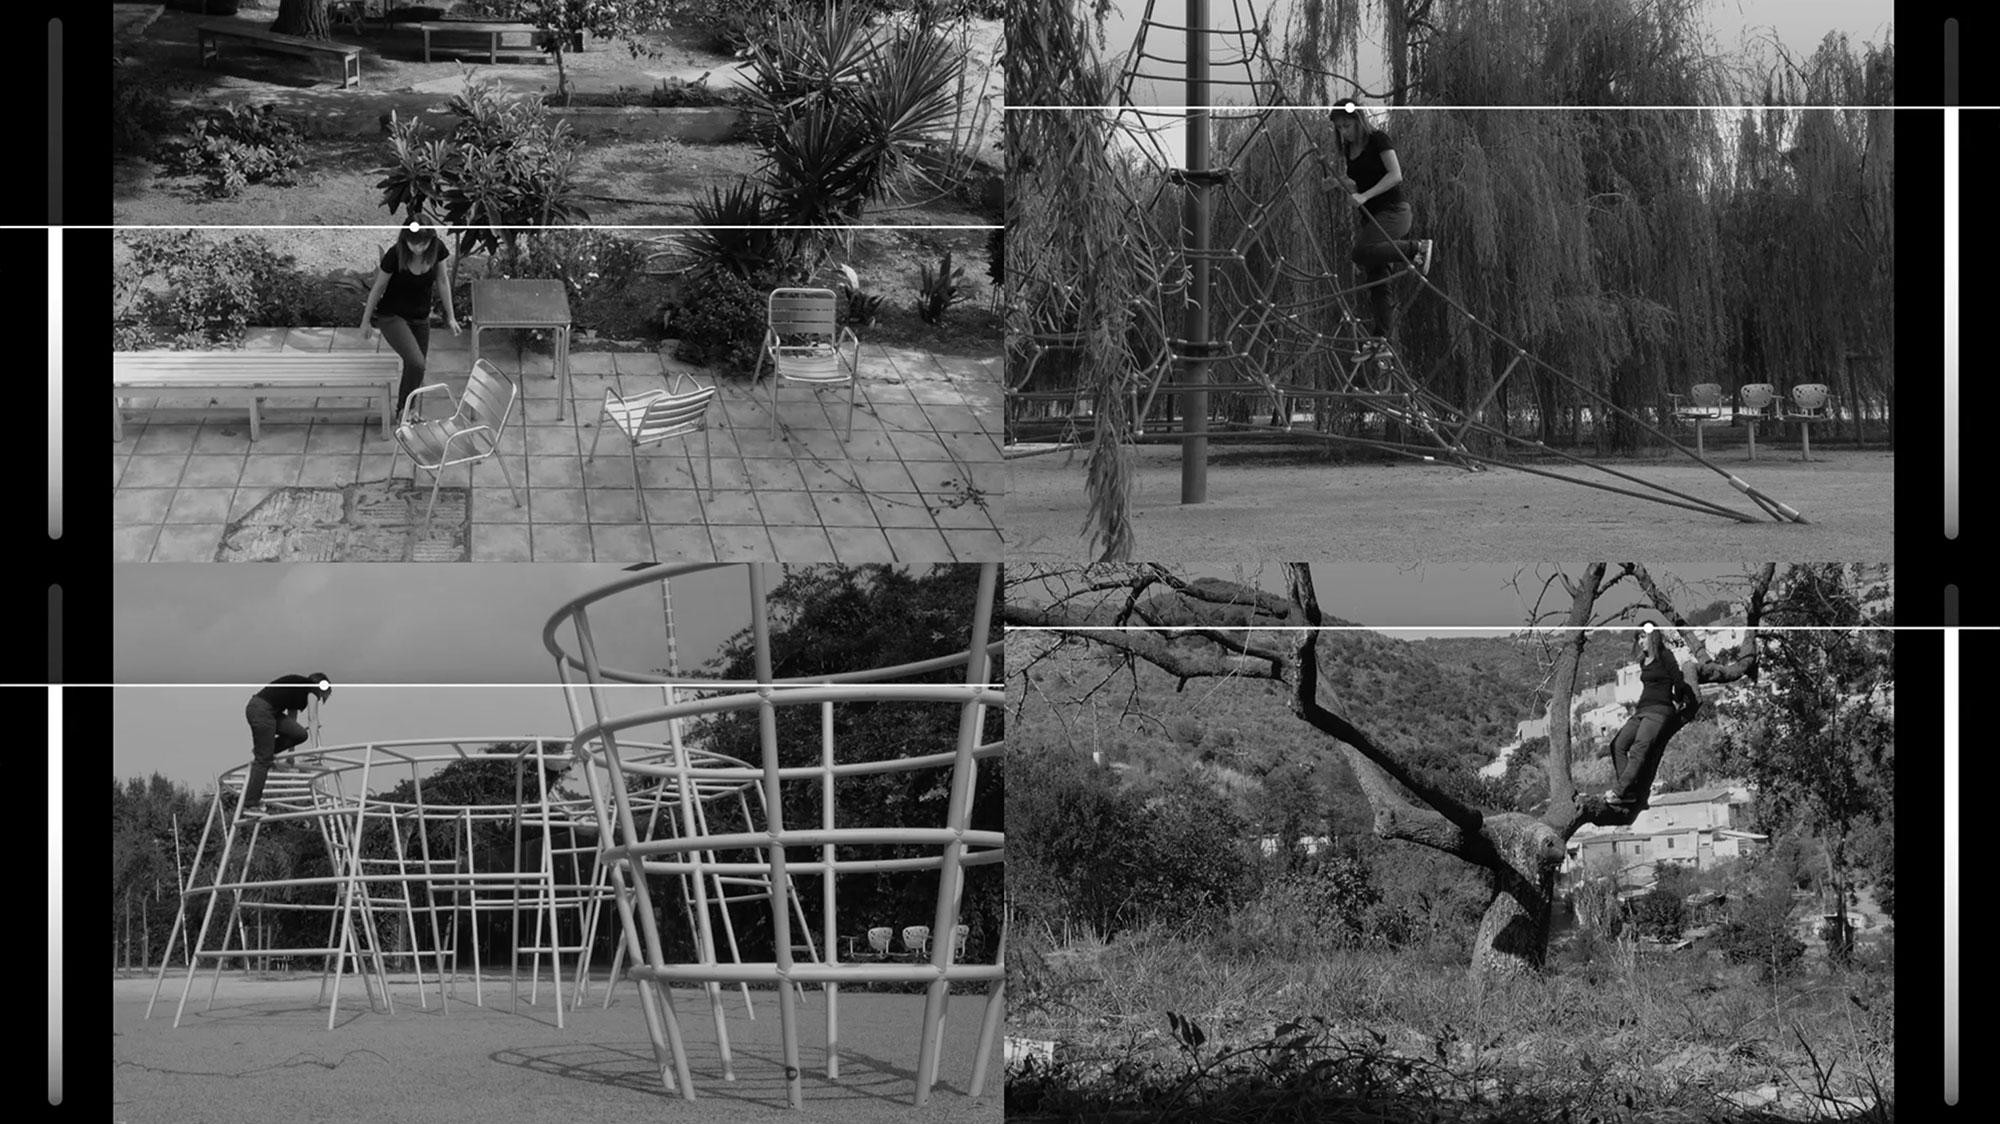 Jacek Doroszenko - The same horizon repeated at every moment of the walk - video 03